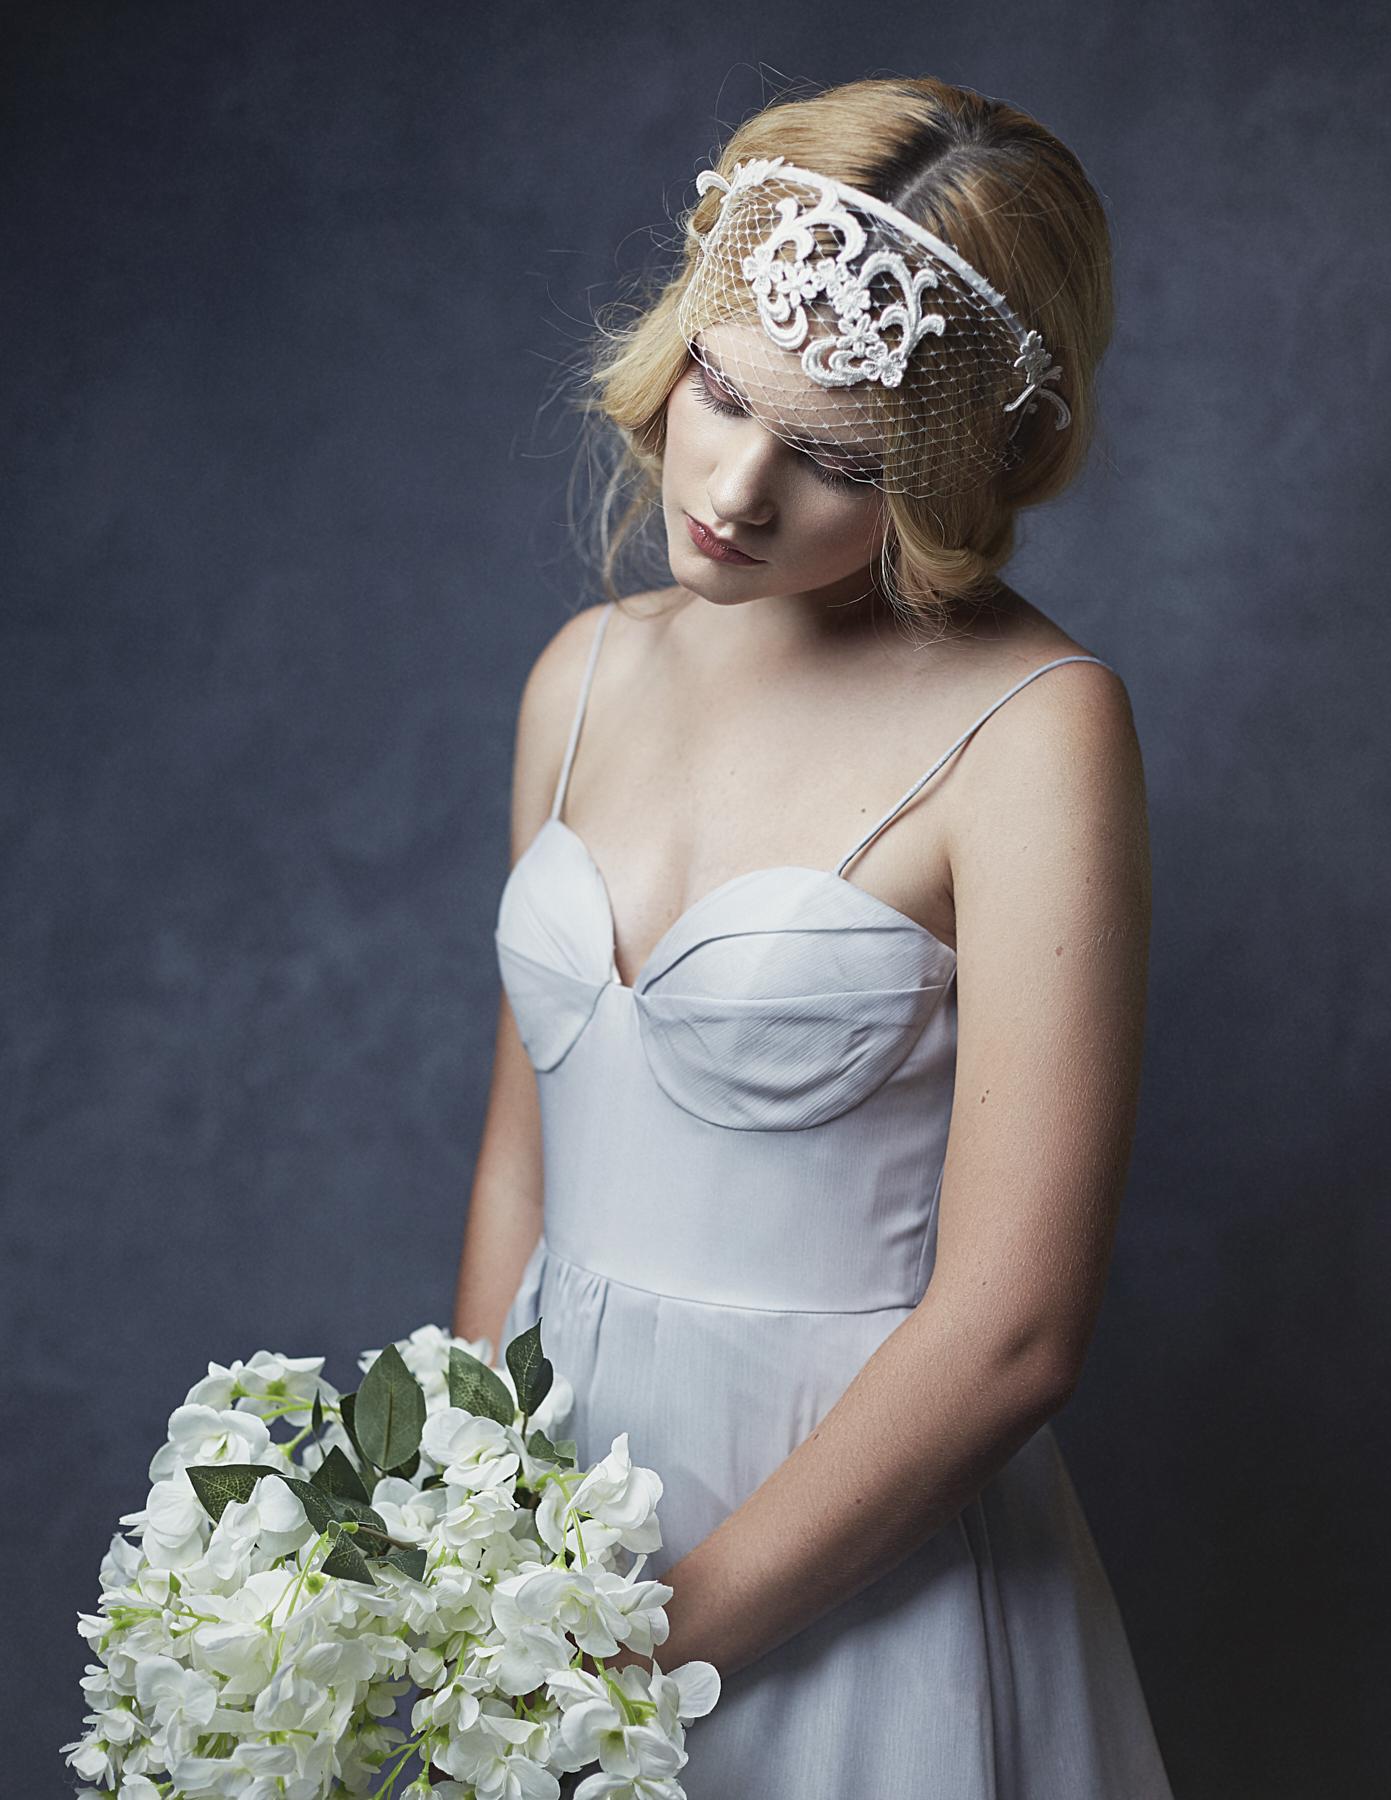 Emilie-Tournevache-Photographer-Fashion